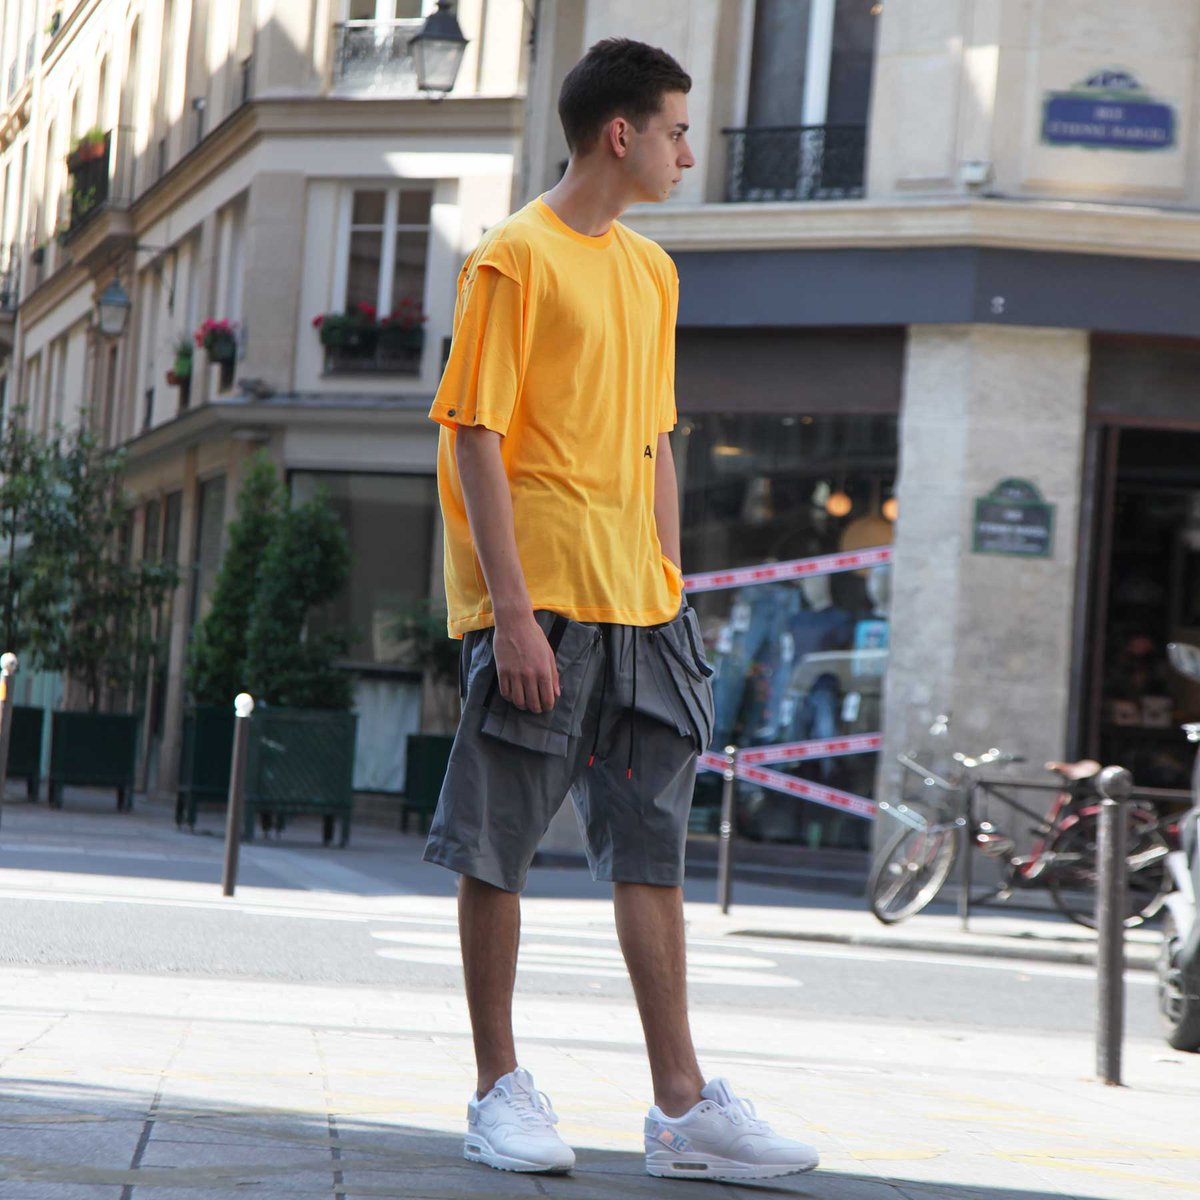 f76a7a7468 ... ACG Deploy Short > Nike Air Max 1-100 Available instore and online on  http://www.shinzo.paris #ShinzoParis #ShinzoLab #EtienneMarcel #Paris  #StreetStyle ...